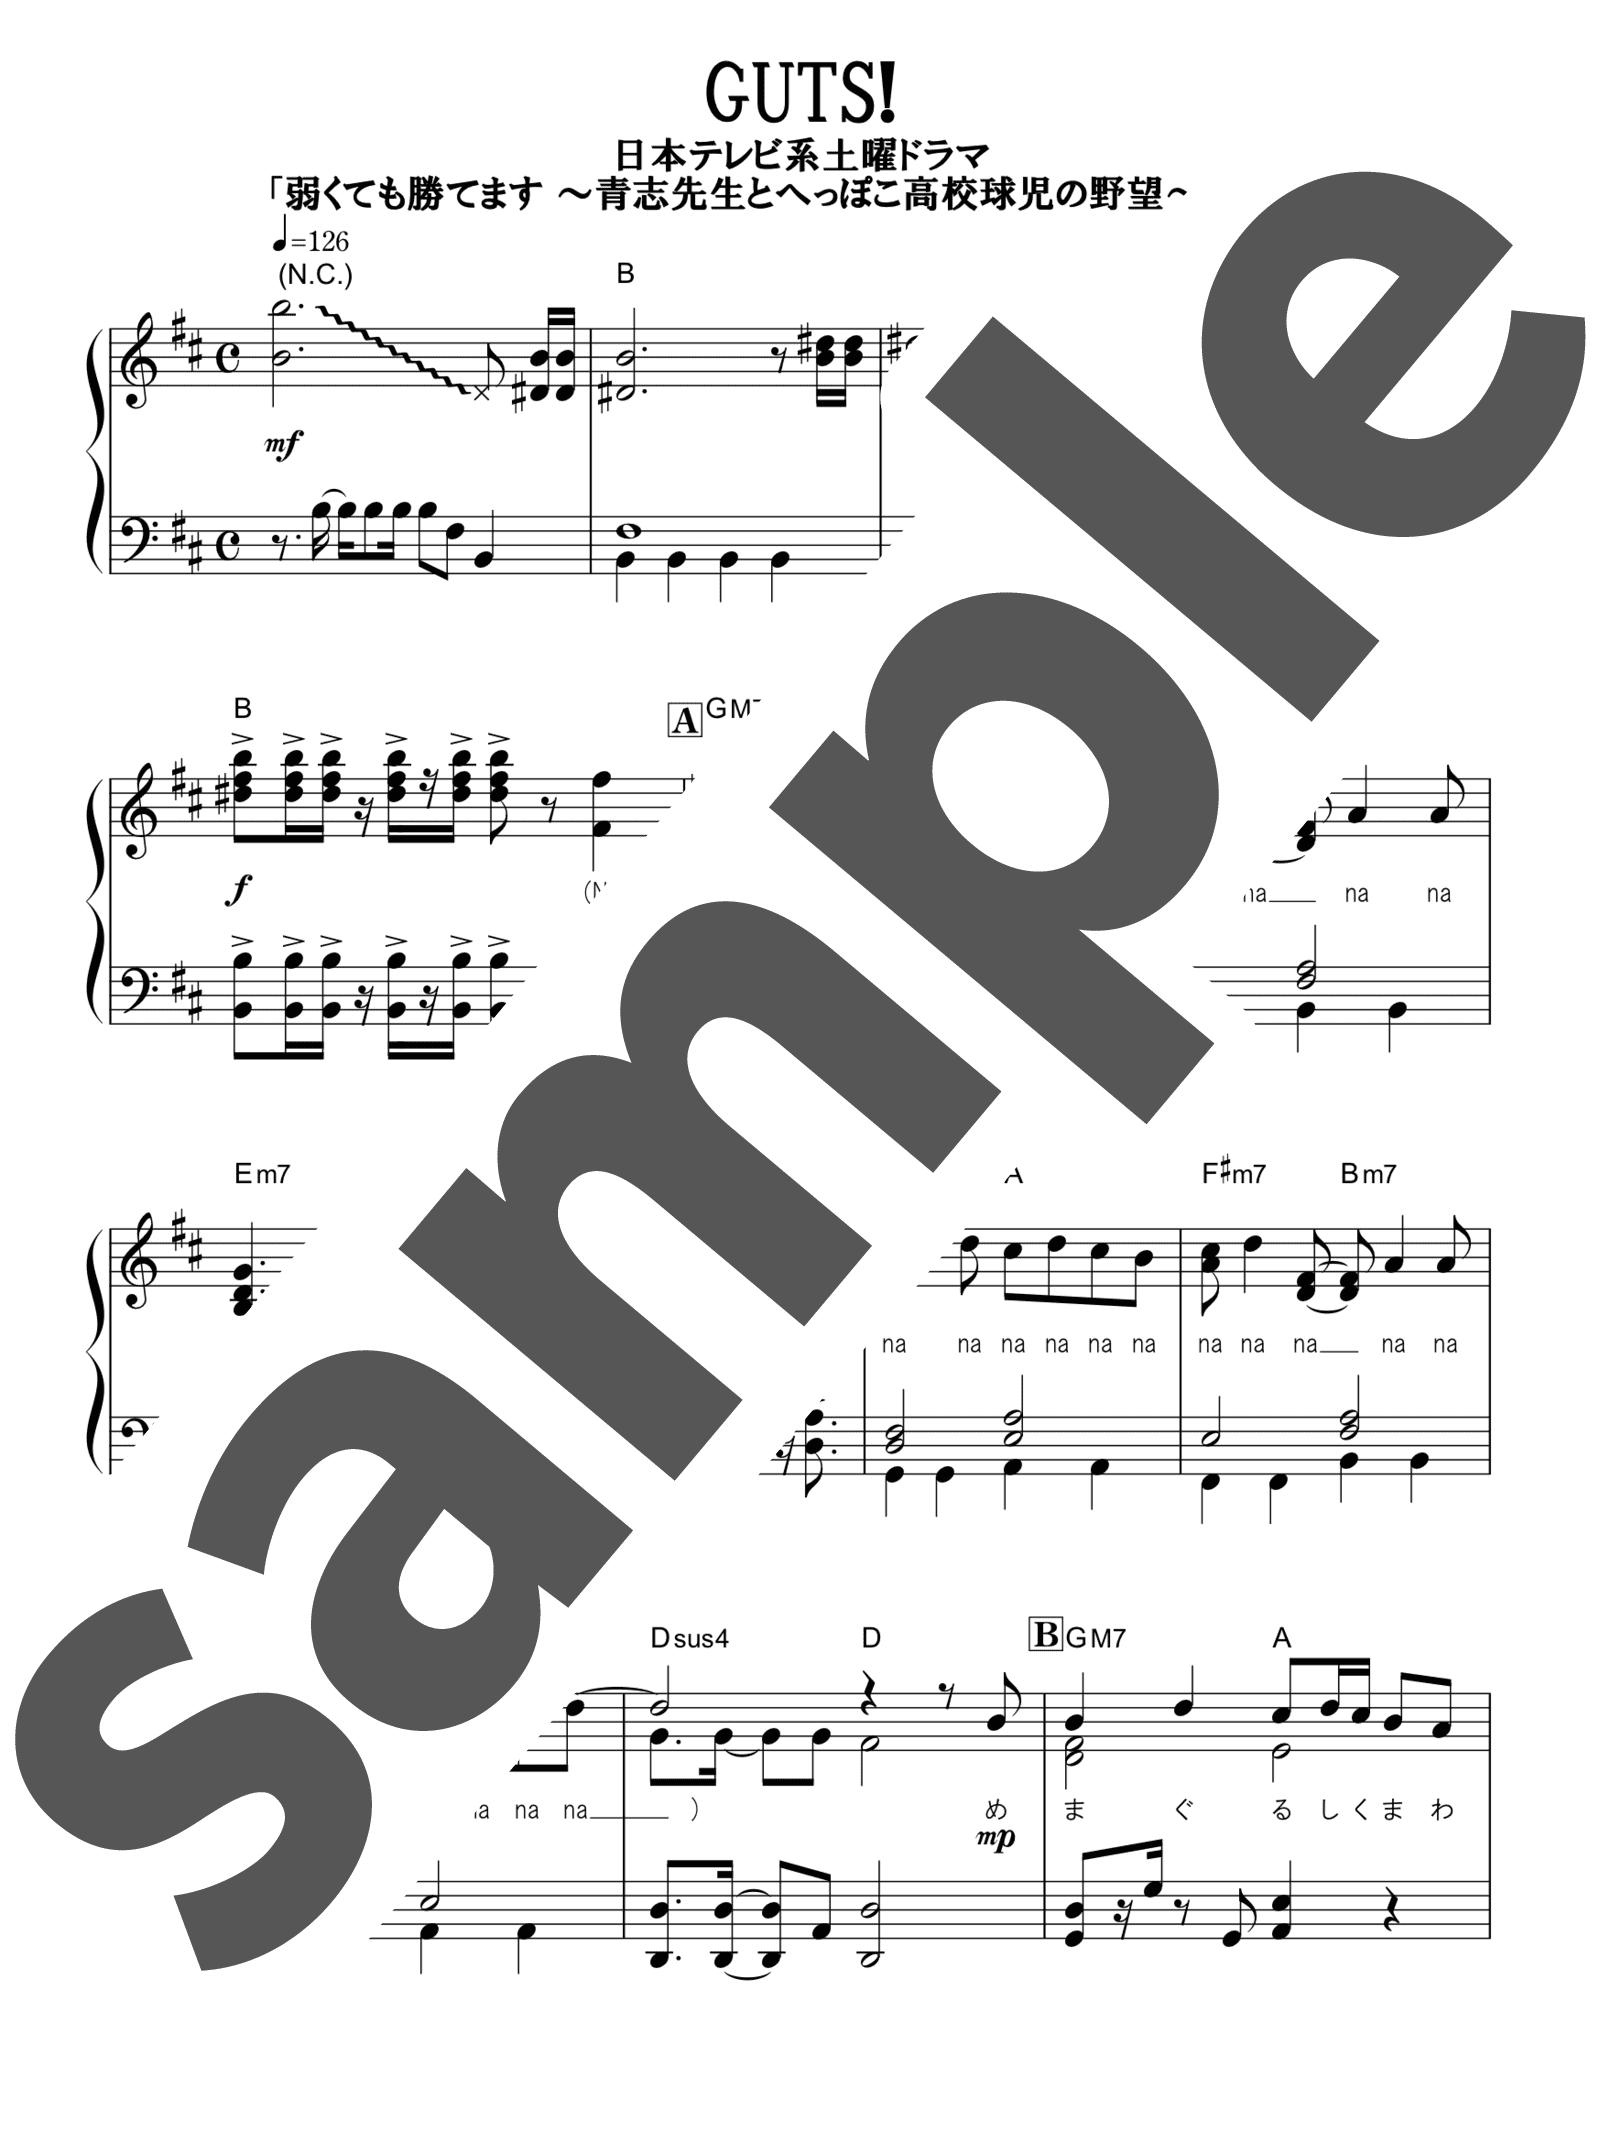 「GUTS!」のサンプル楽譜